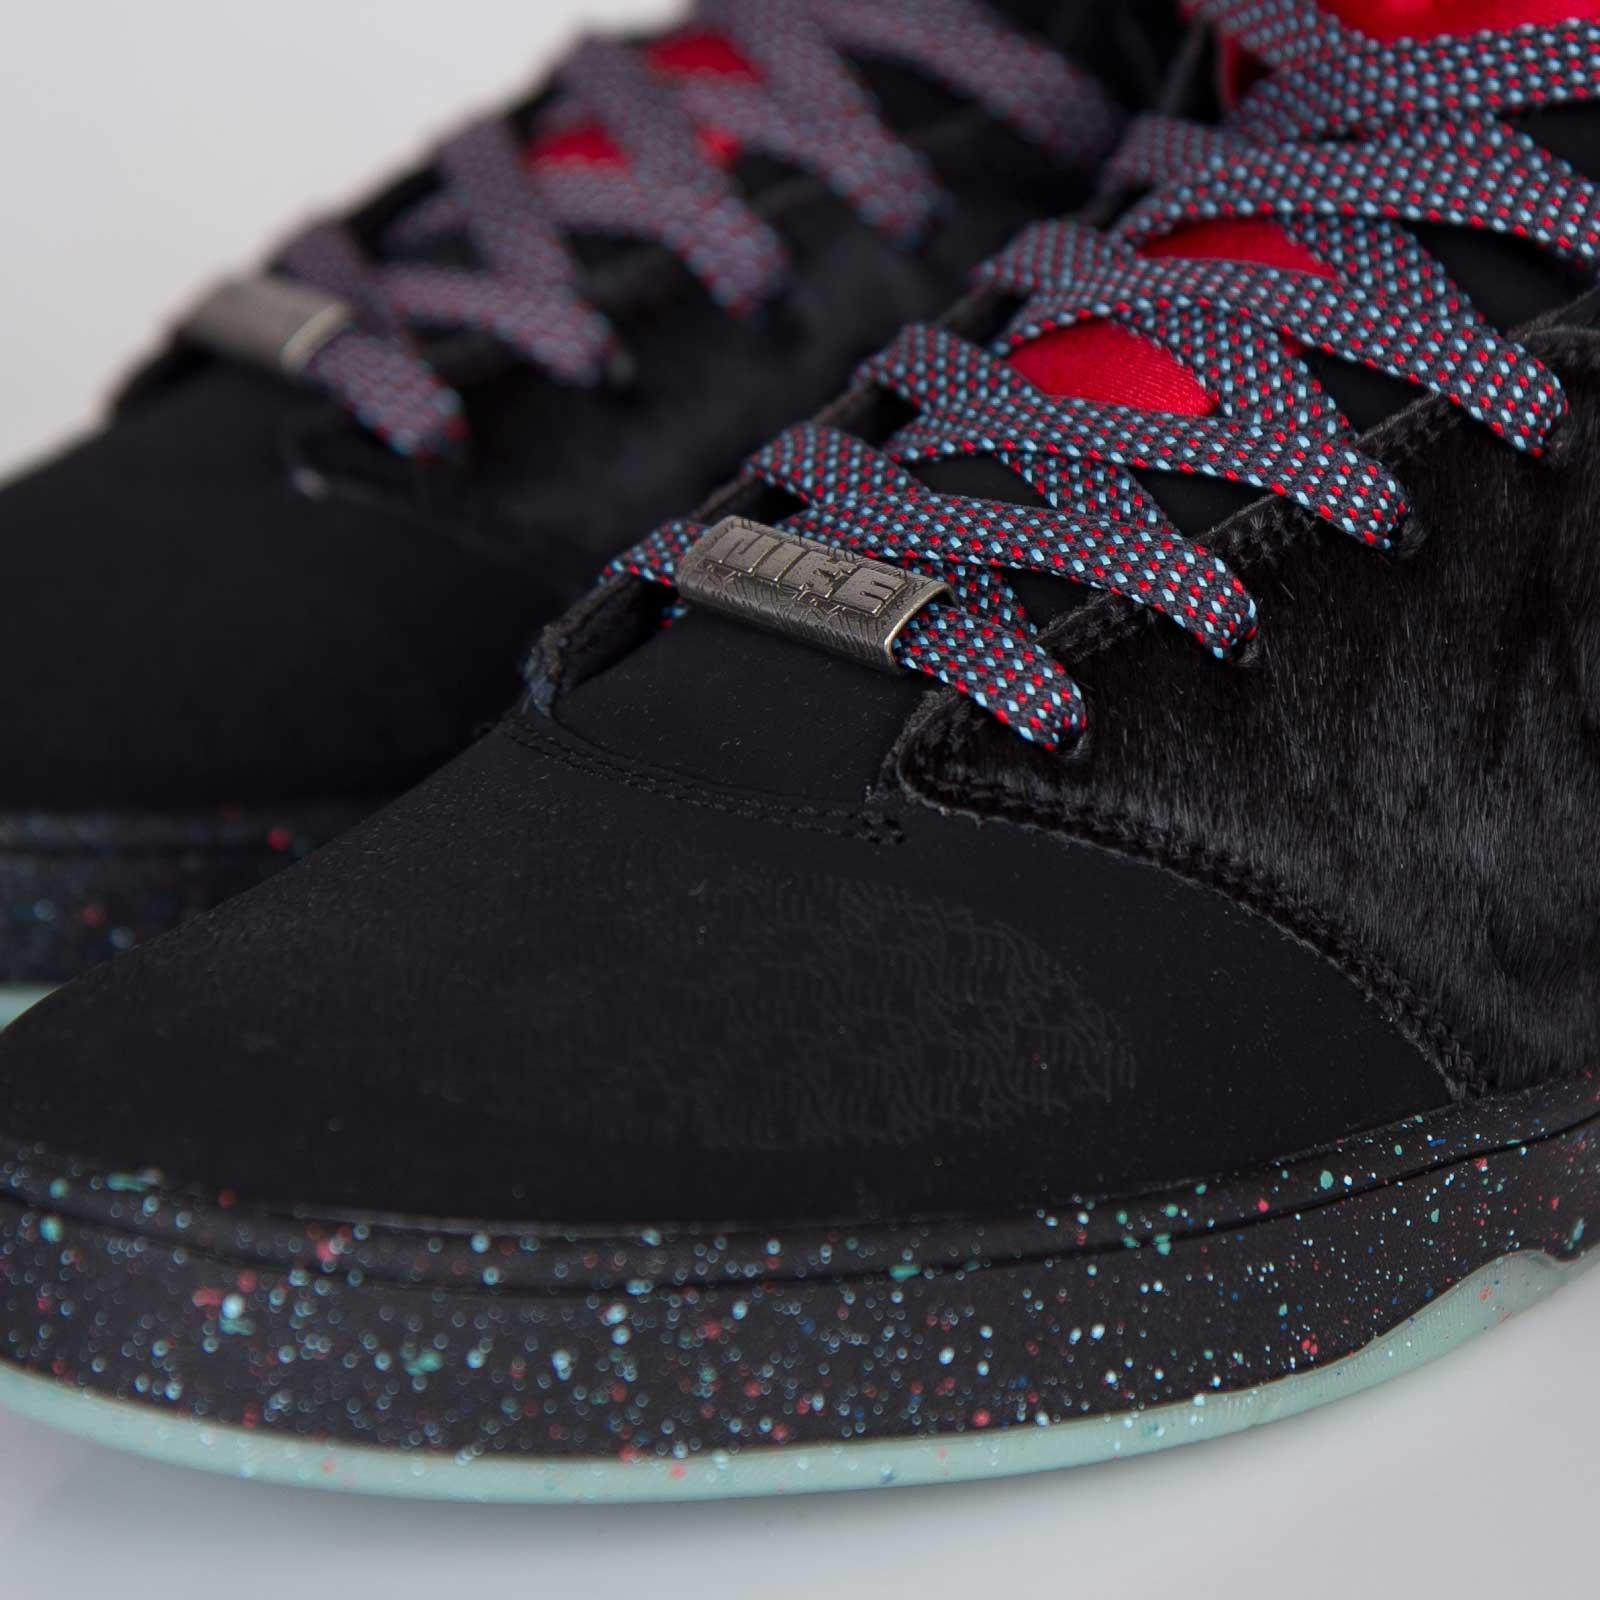 b21c23f85c3 Nike Kobe 9 NSW Lifestyle YOH QS - 647594-001 - Sneakersnstuff ...